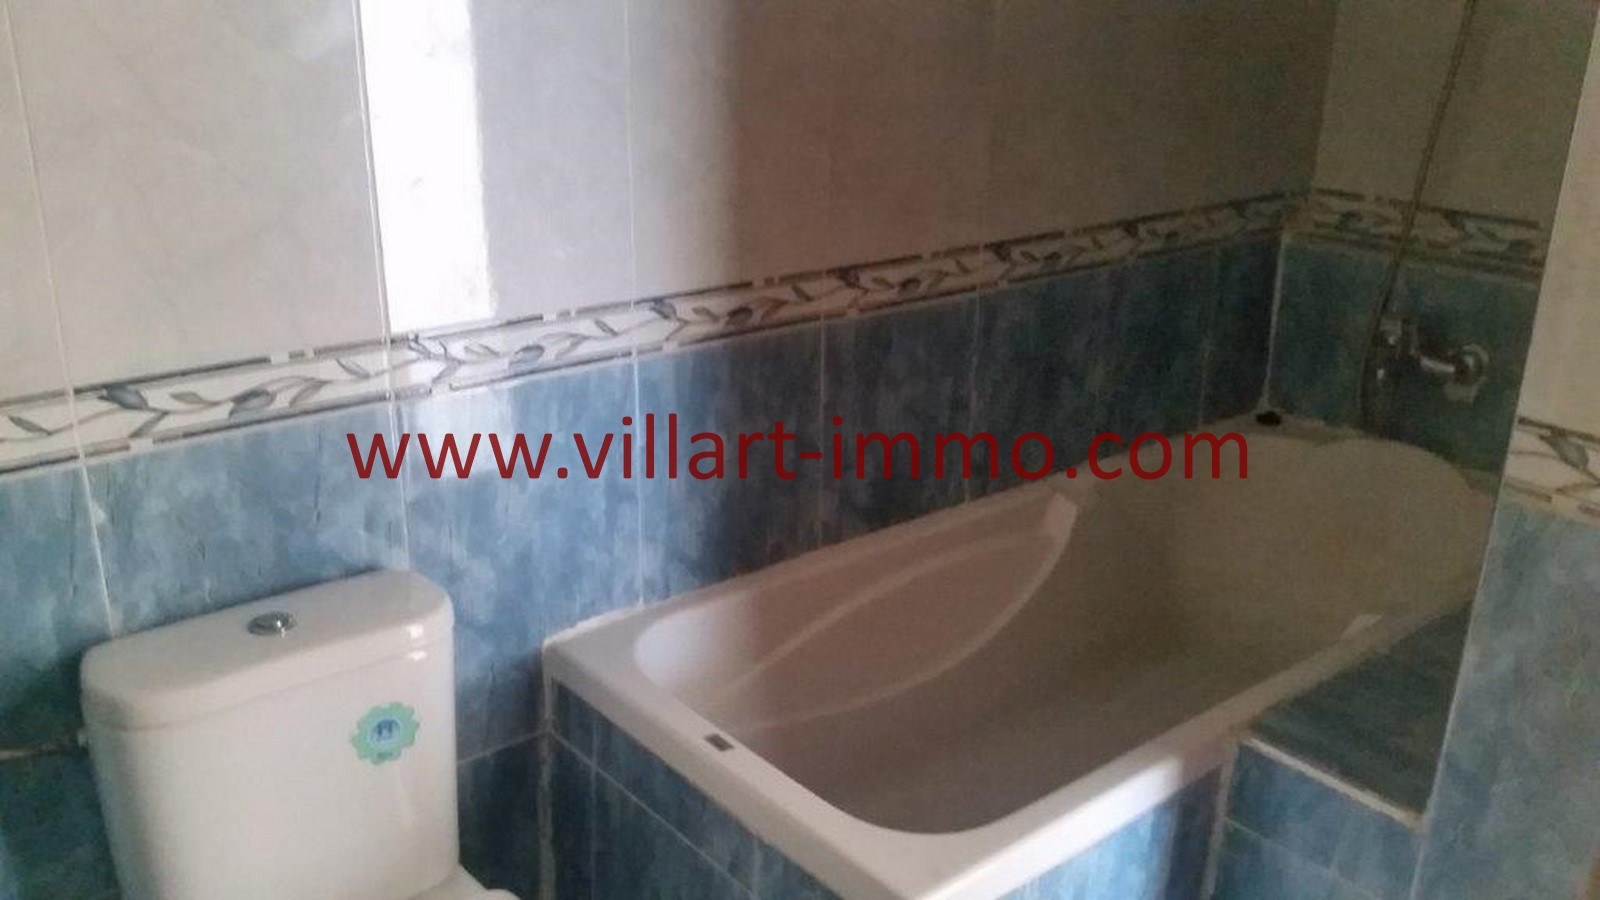 13-A louer-Tanger-Appartement-Non meublée-Centre ville-Salle de bain-L1029